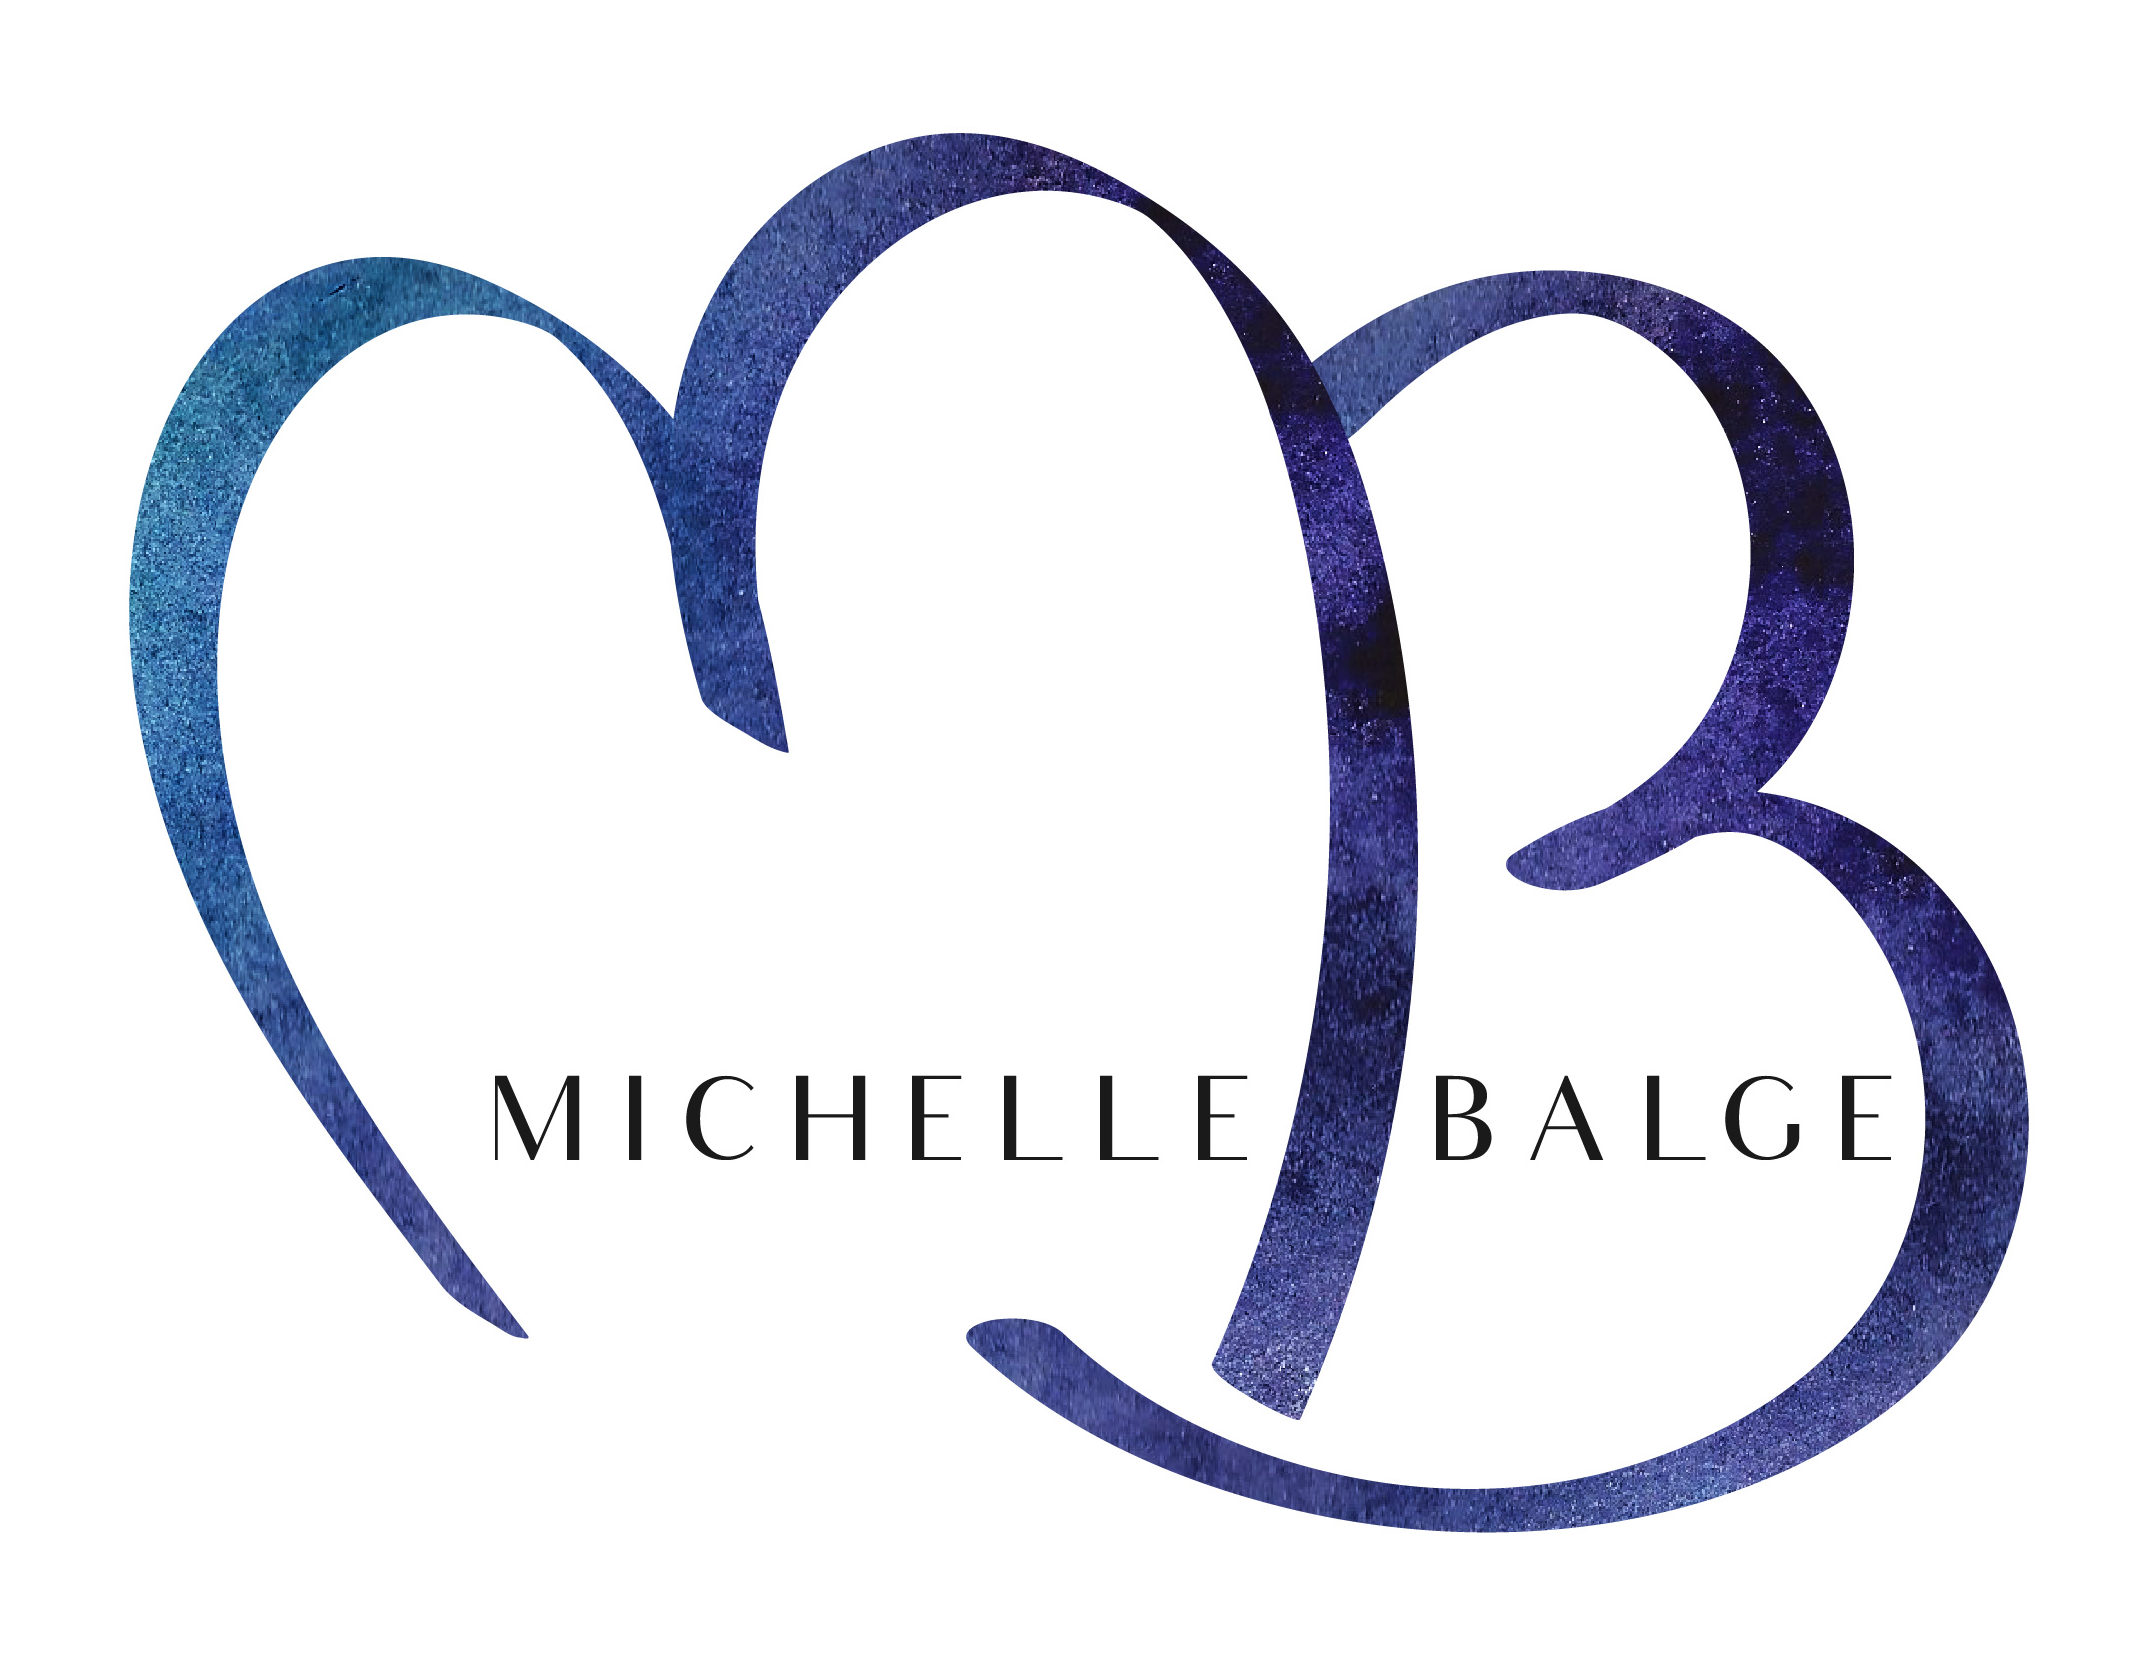 Michelle Balge